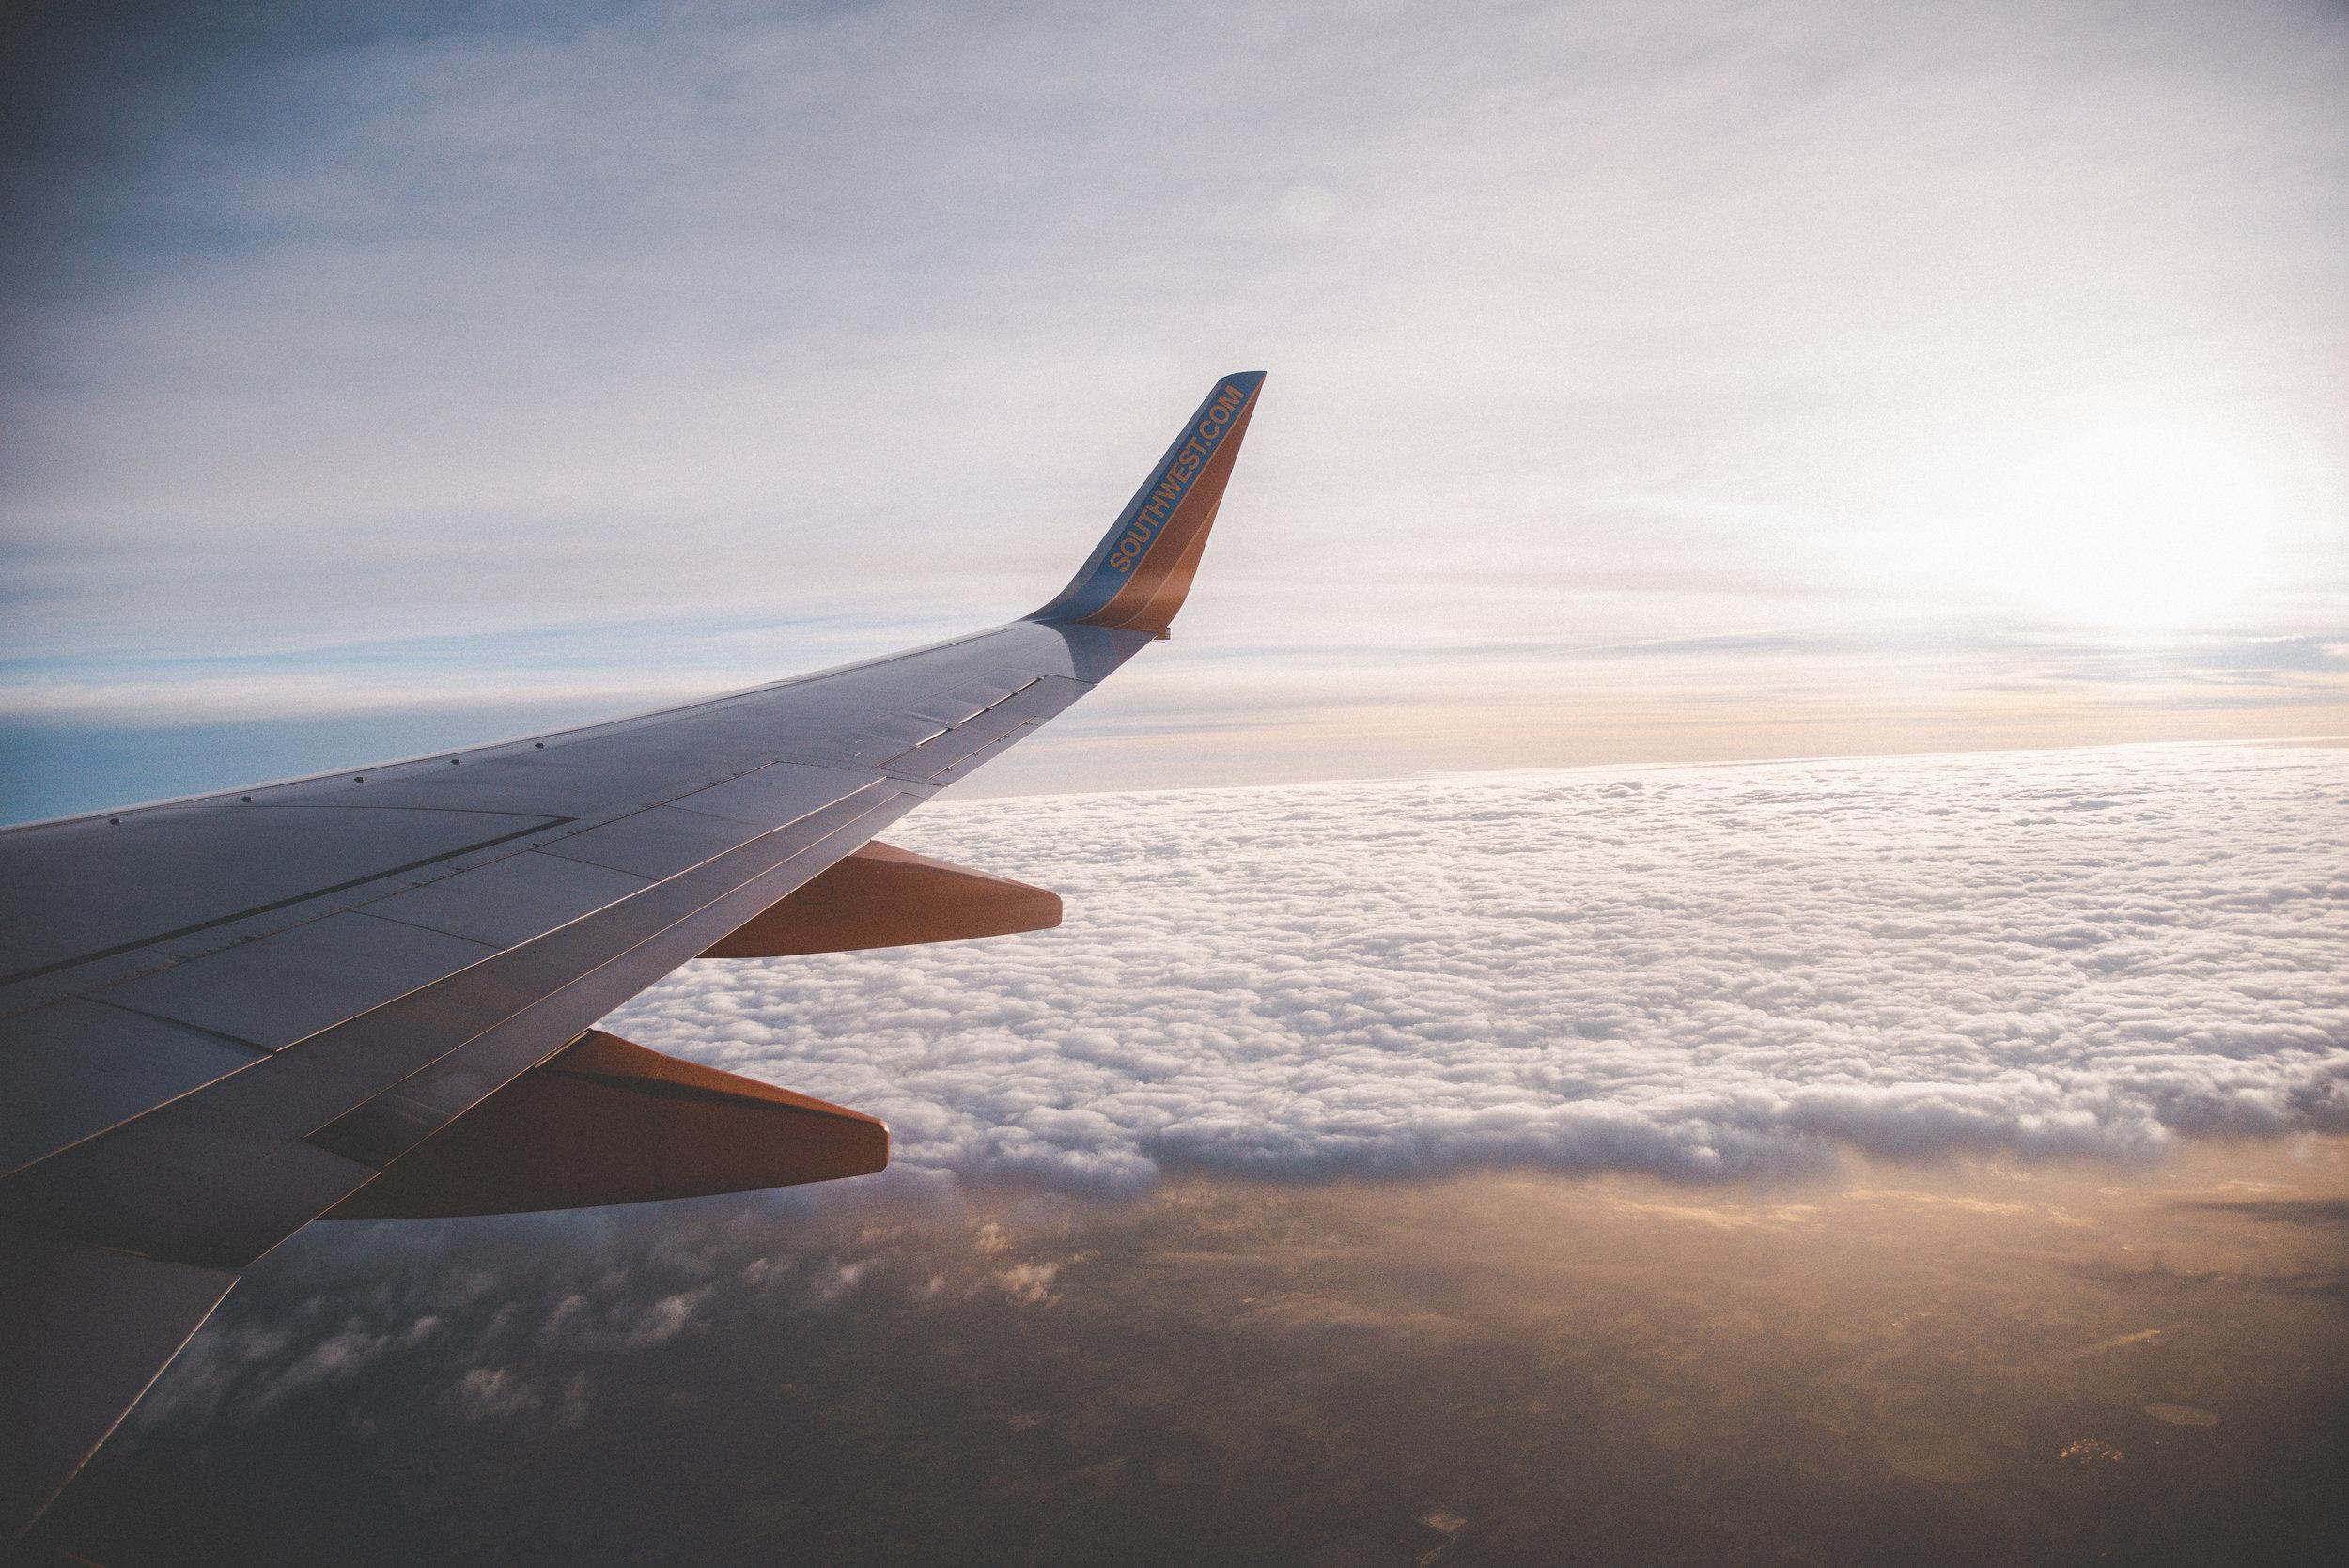 Plane-14.jpg